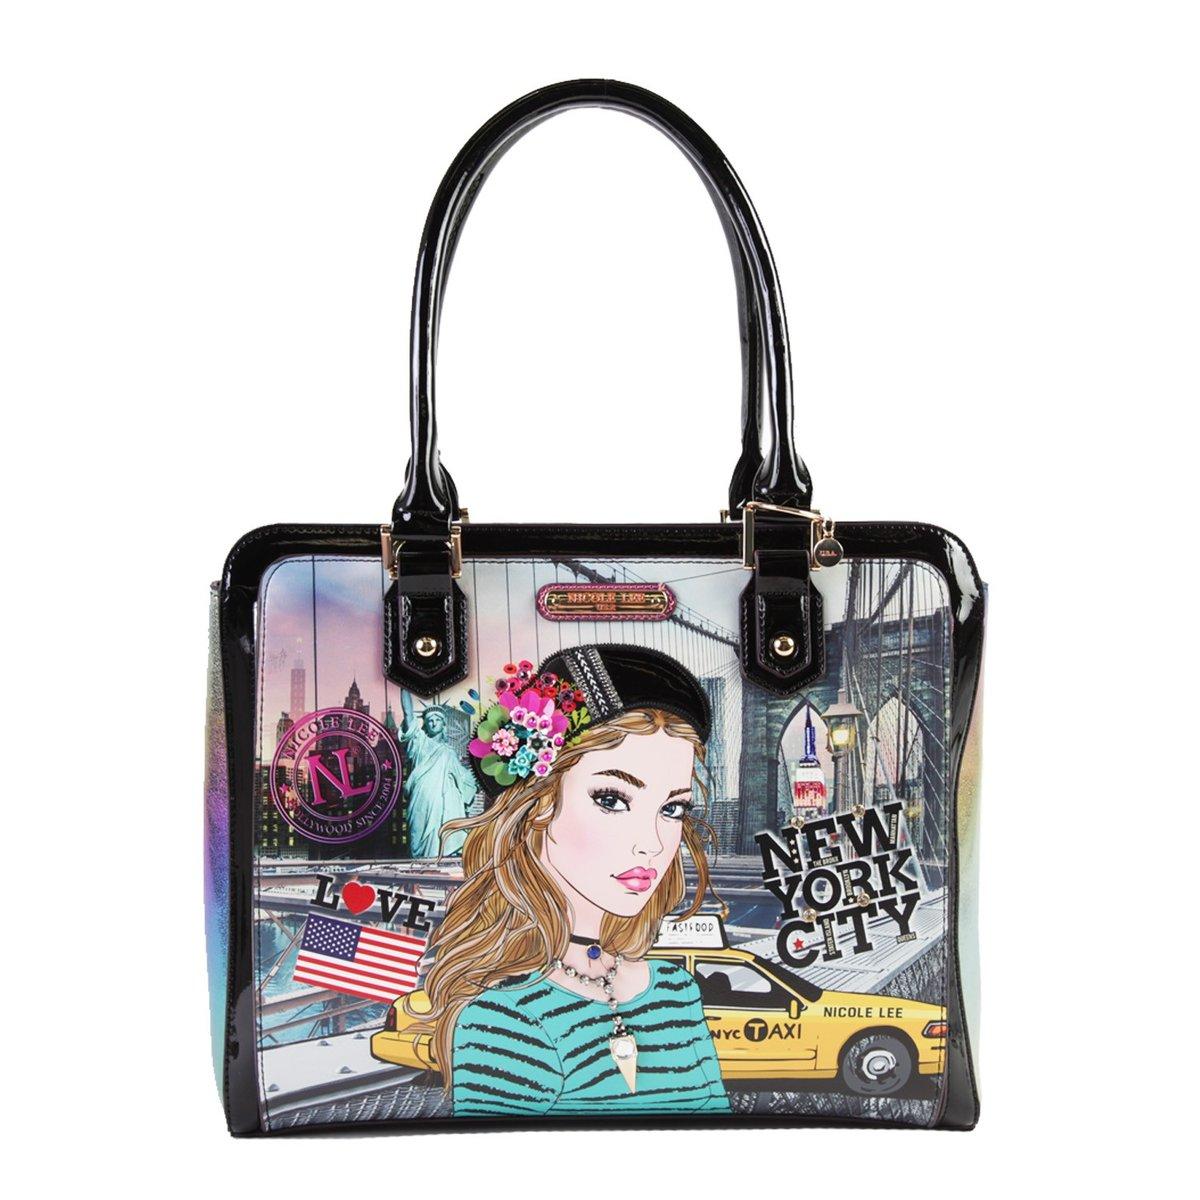 Nicole Lee, Torebka damska Briefcase Bag, Ivette Poses On Ny